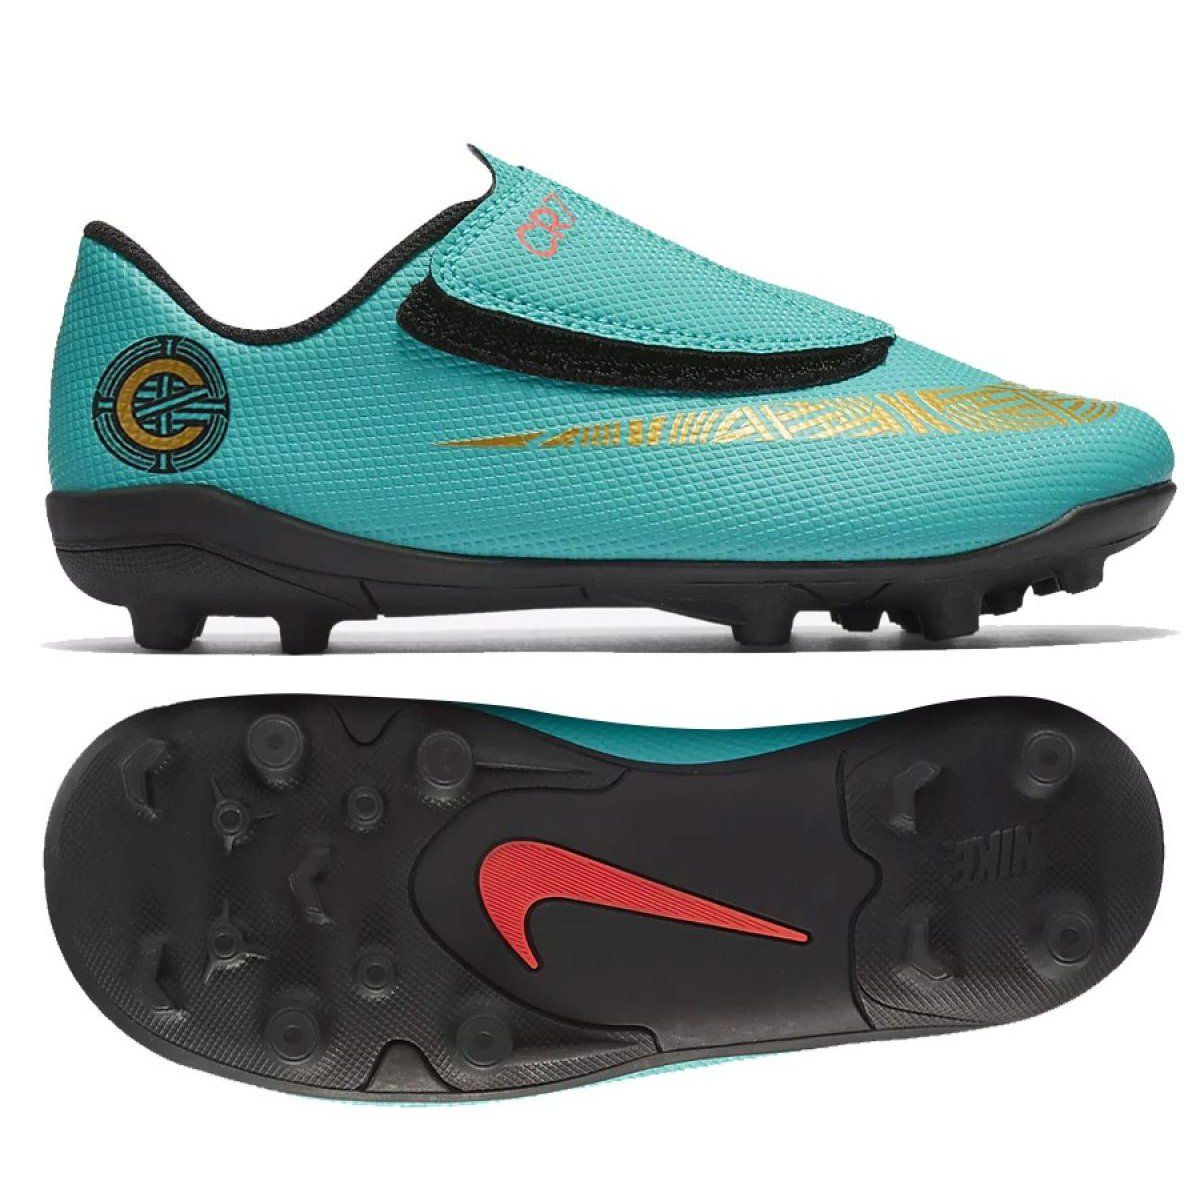 Korki Pilka Nozna Sport Nike Buty Pilkarskie Nike Mercurial Vapor 12 Club Ps V Cr7 Mg Jr Aj3096 390 Kids Football Shoes Football Shoes Shoes